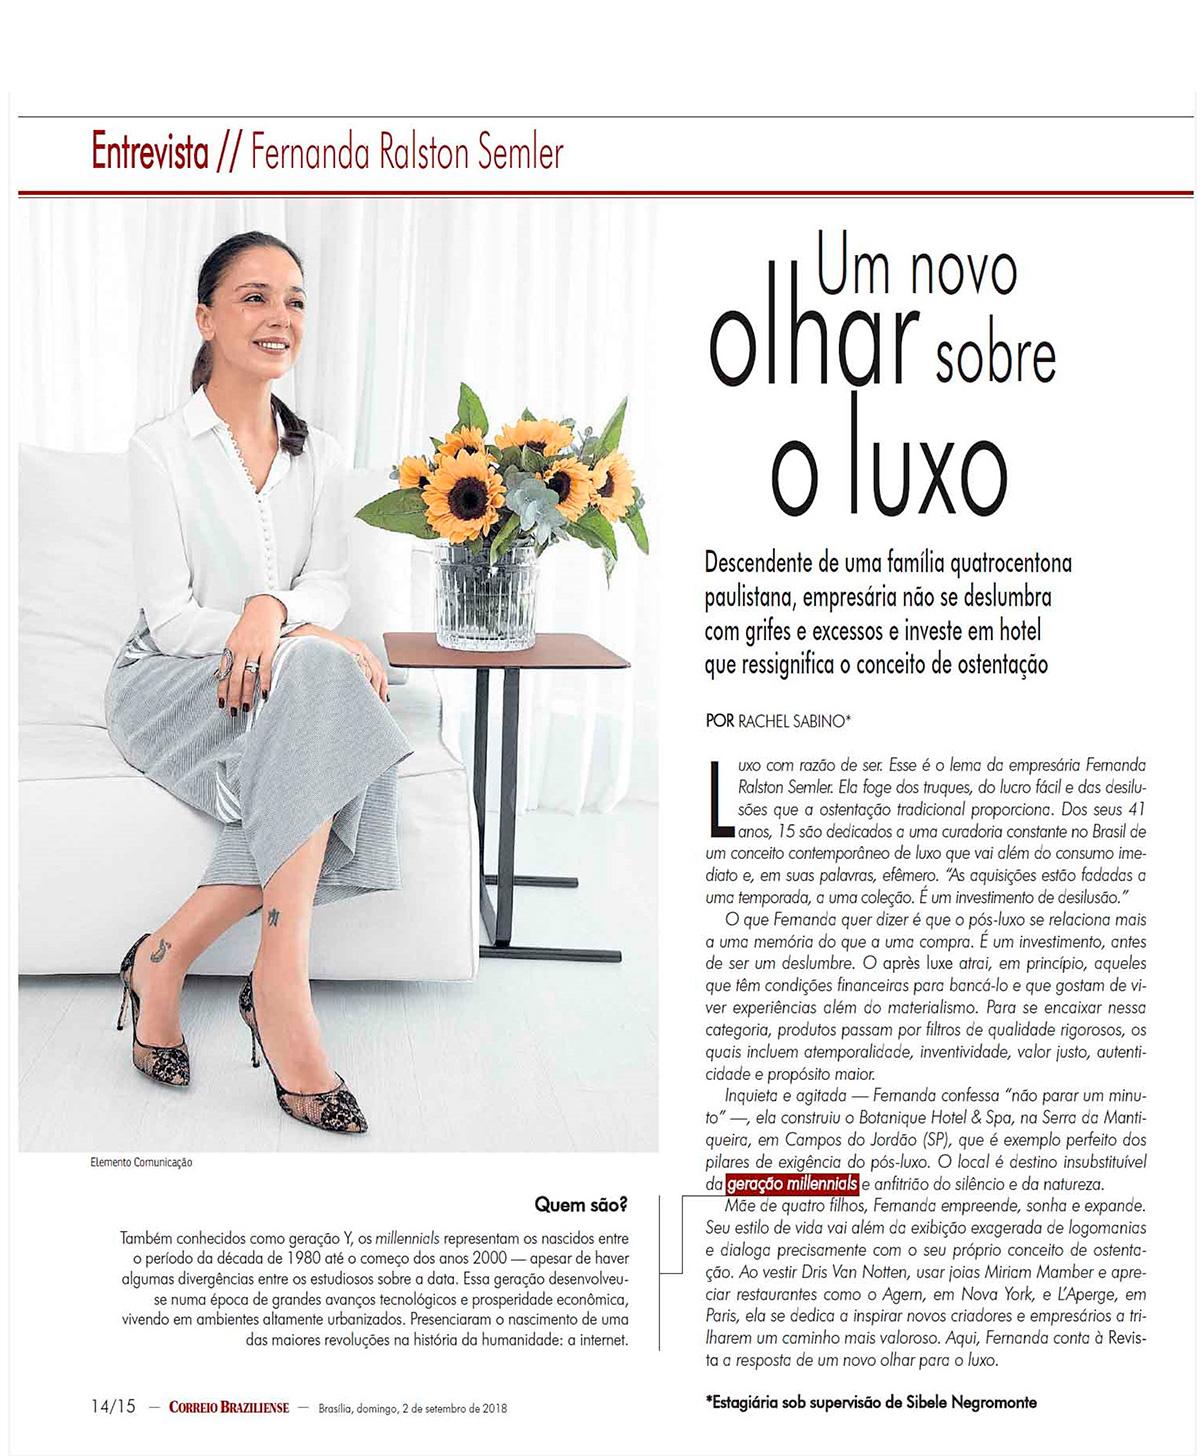 Correio Braziliense - Fernanda Ralston Semler - Um novo olhar sobre o luxo, o Pós-Luxo.